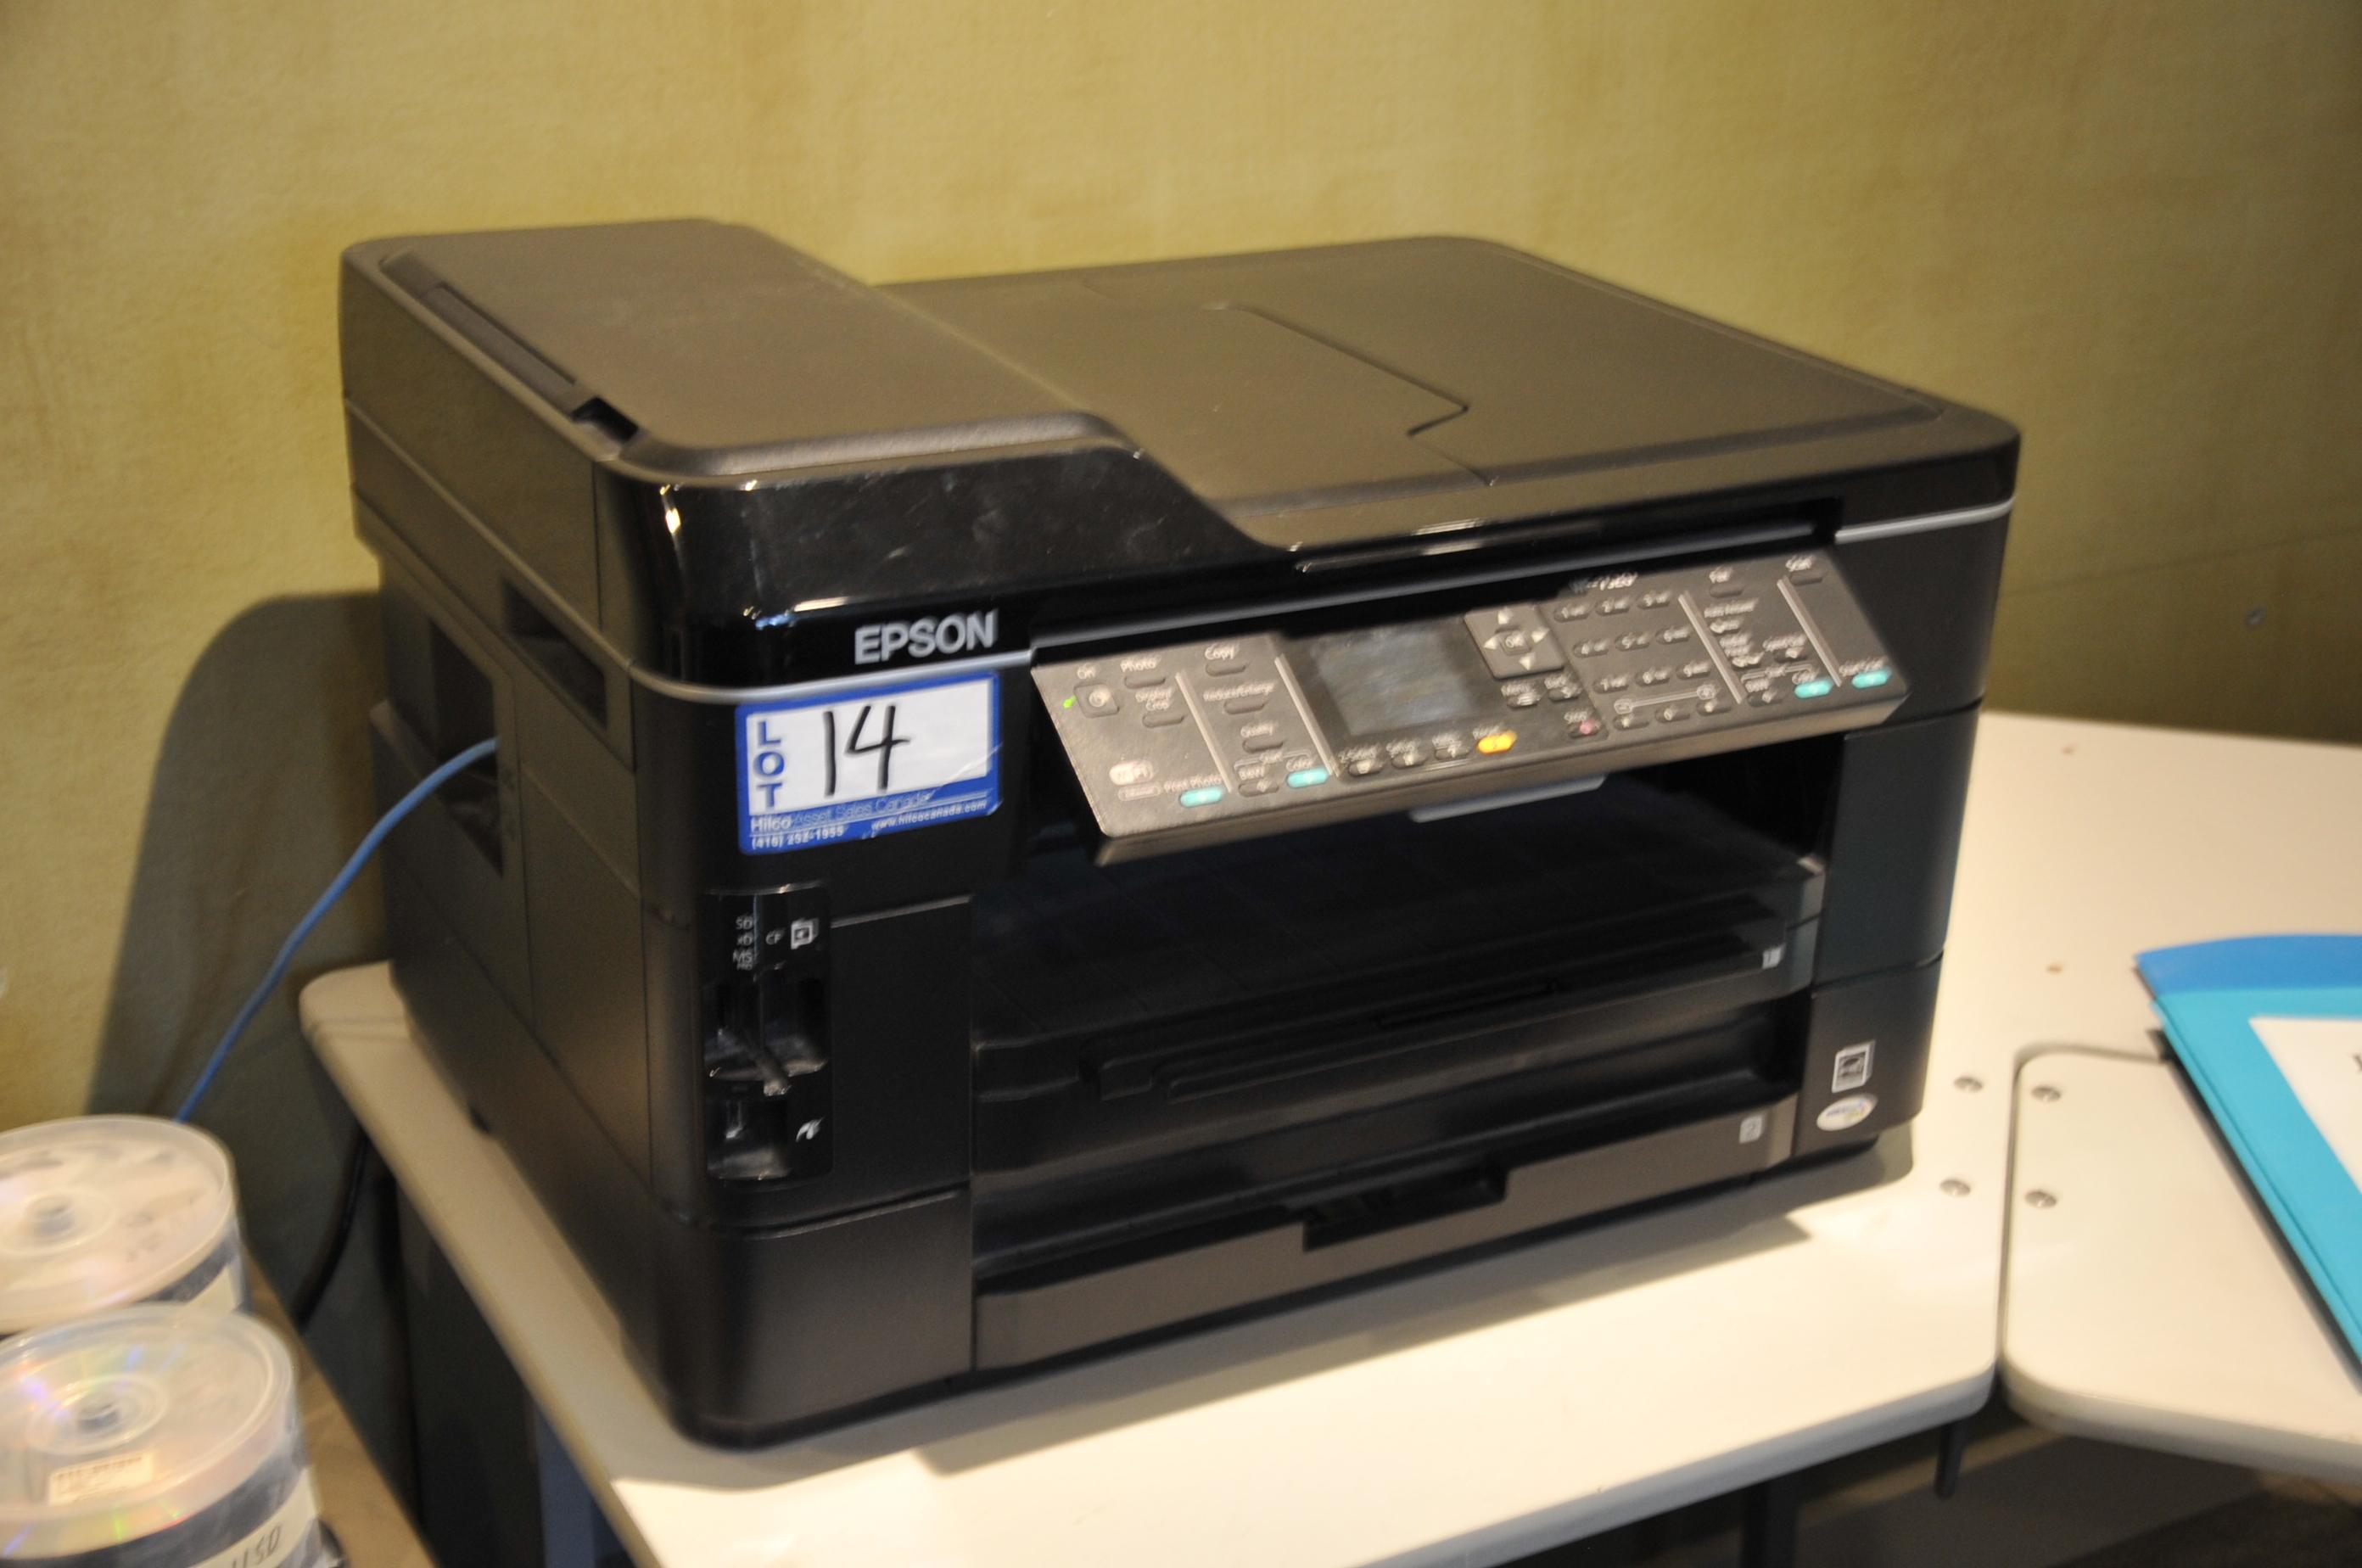 Epson Model WF-7520 Copy/Fax/Scan Printer